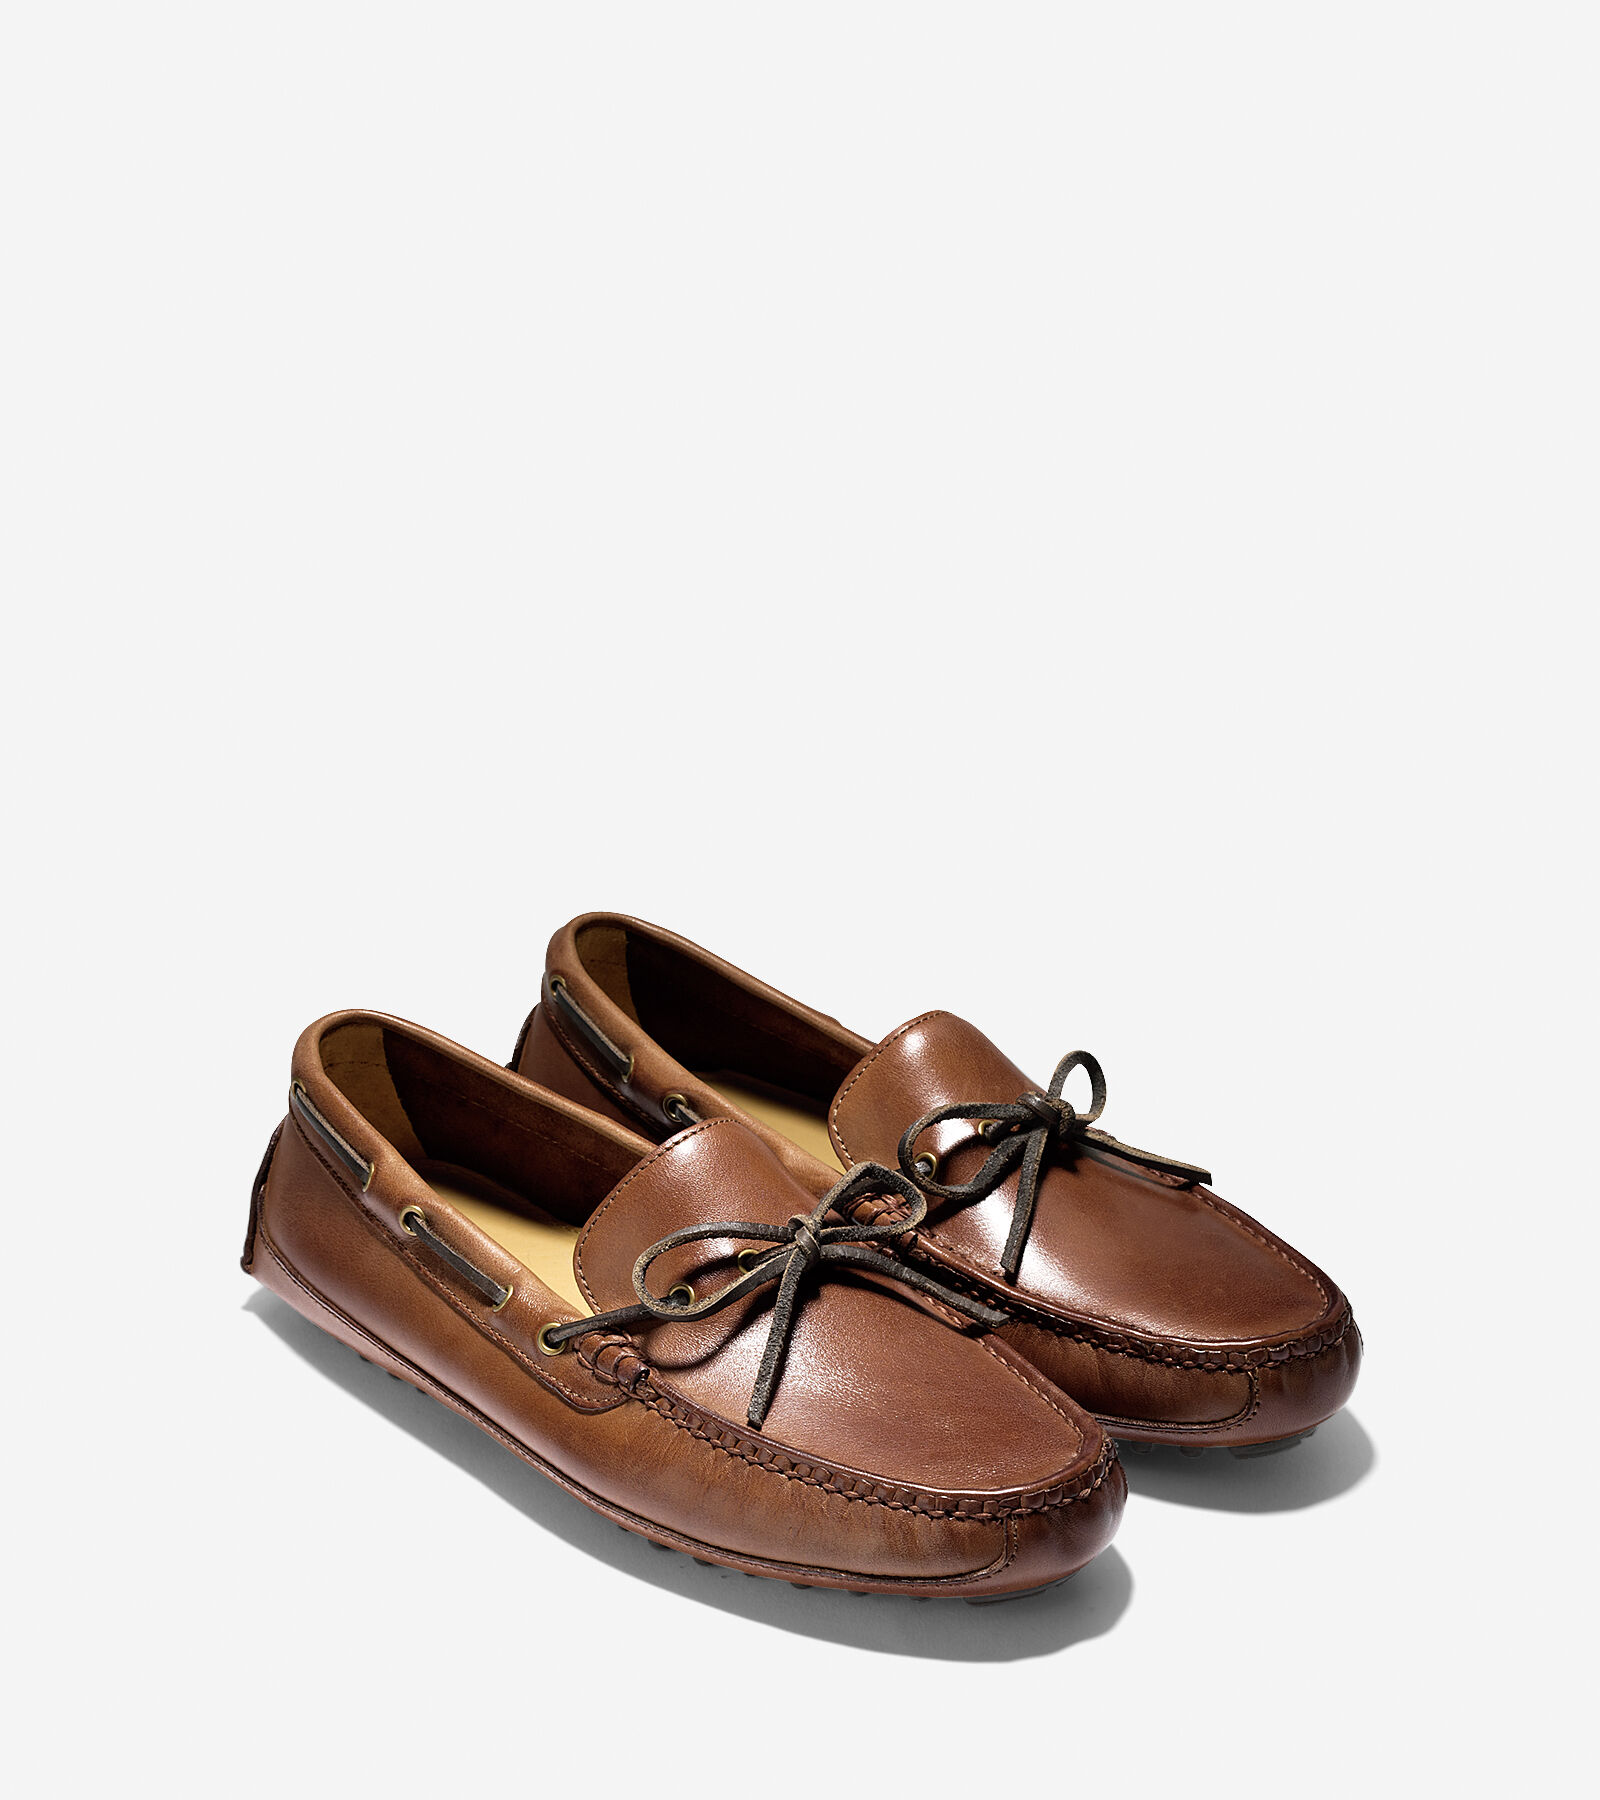 Papaya : Mens Shoes | Cole Haan | Cole Haan